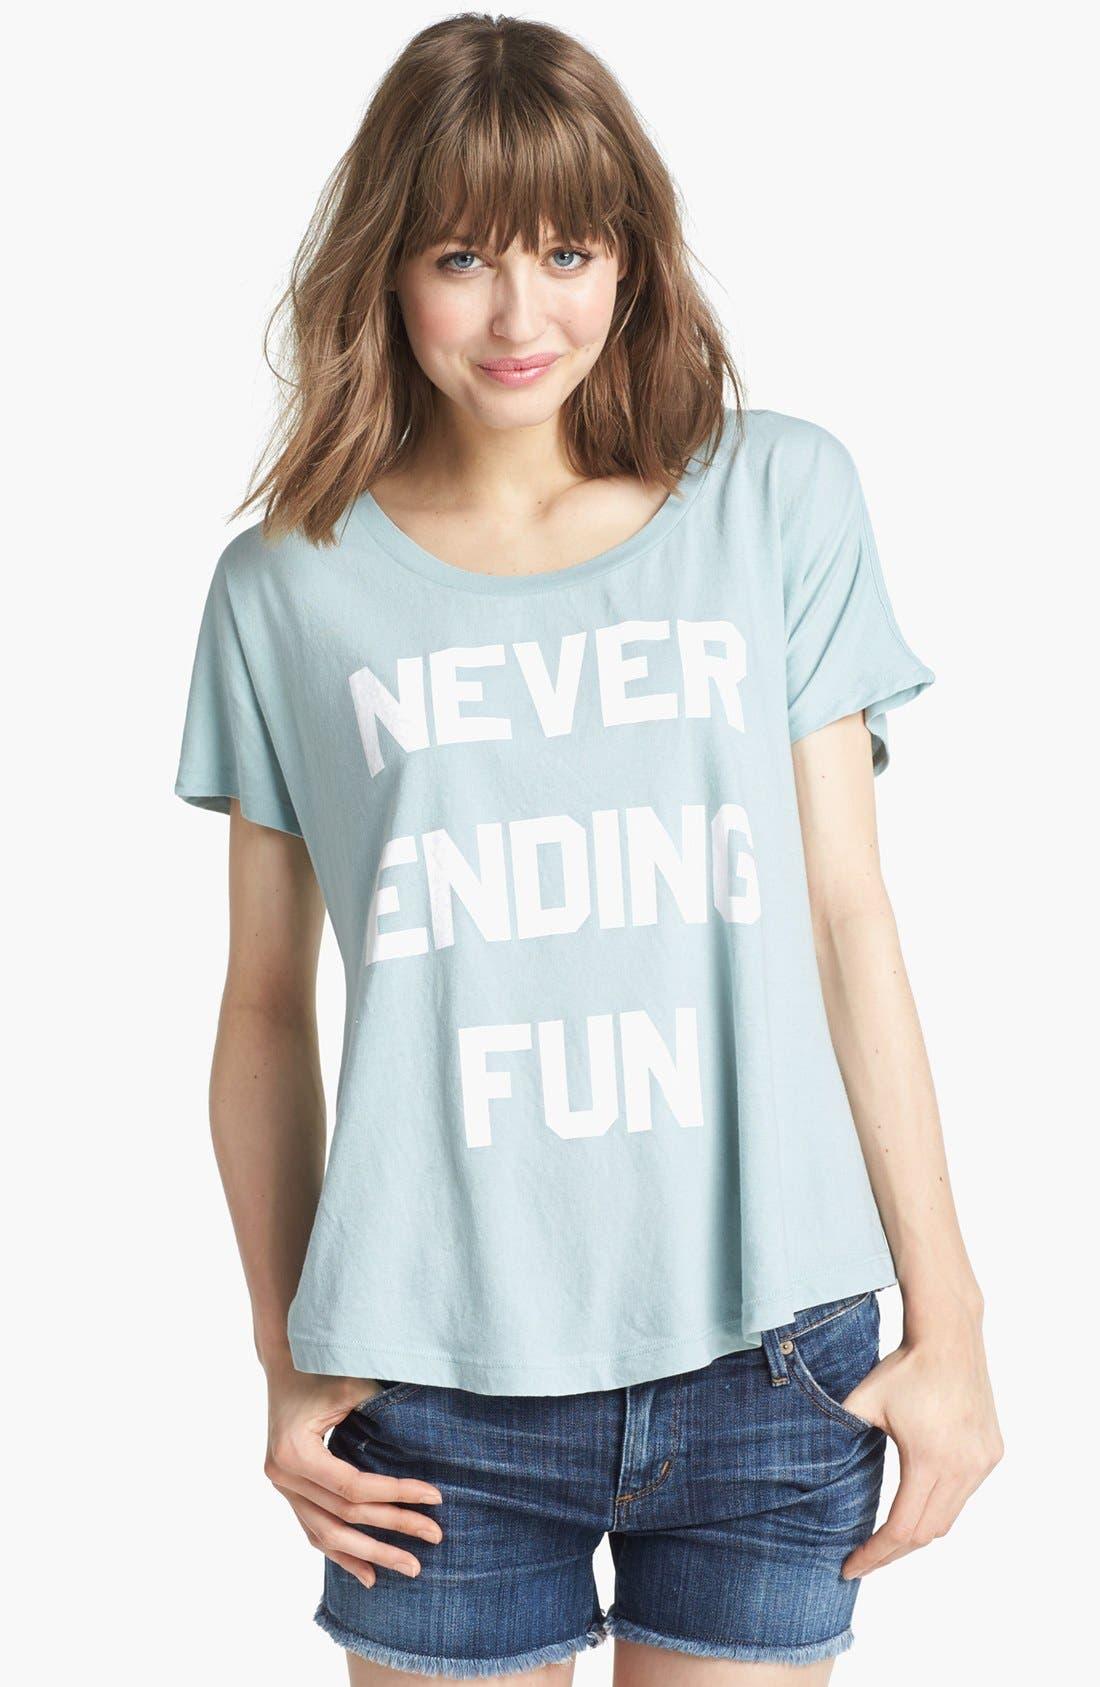 Main Image - Wildfox 'Never Ending Fun' Tee